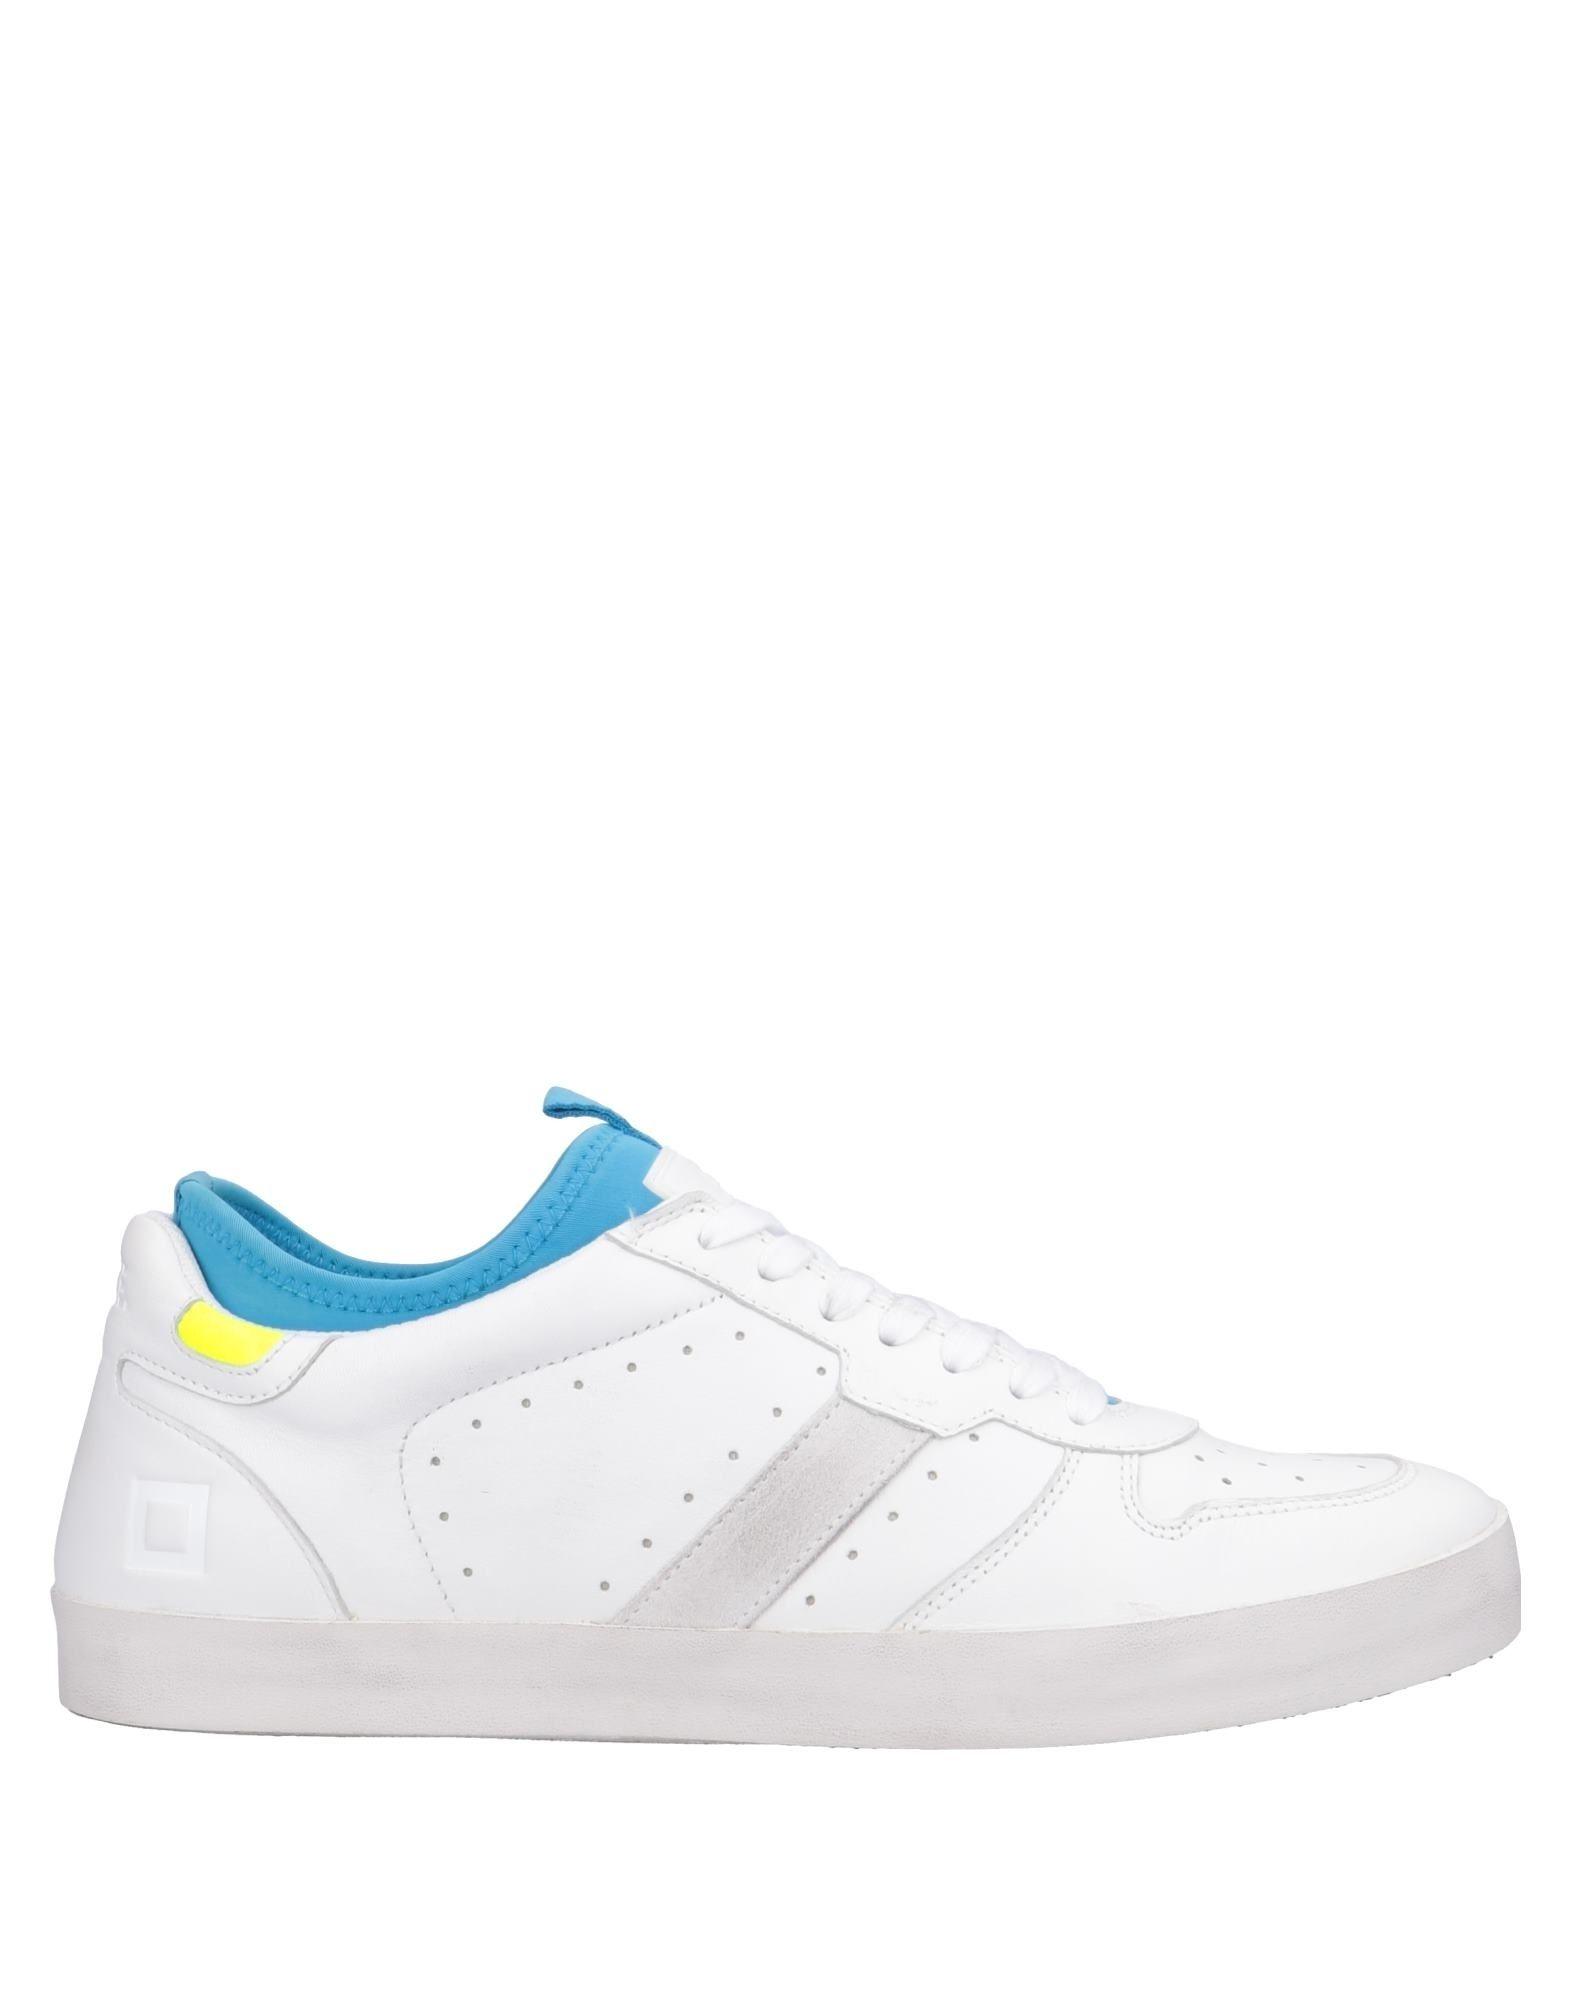 Rabatt echte Schuhe D.A.T.E. Sneakers Herren  11554571HF